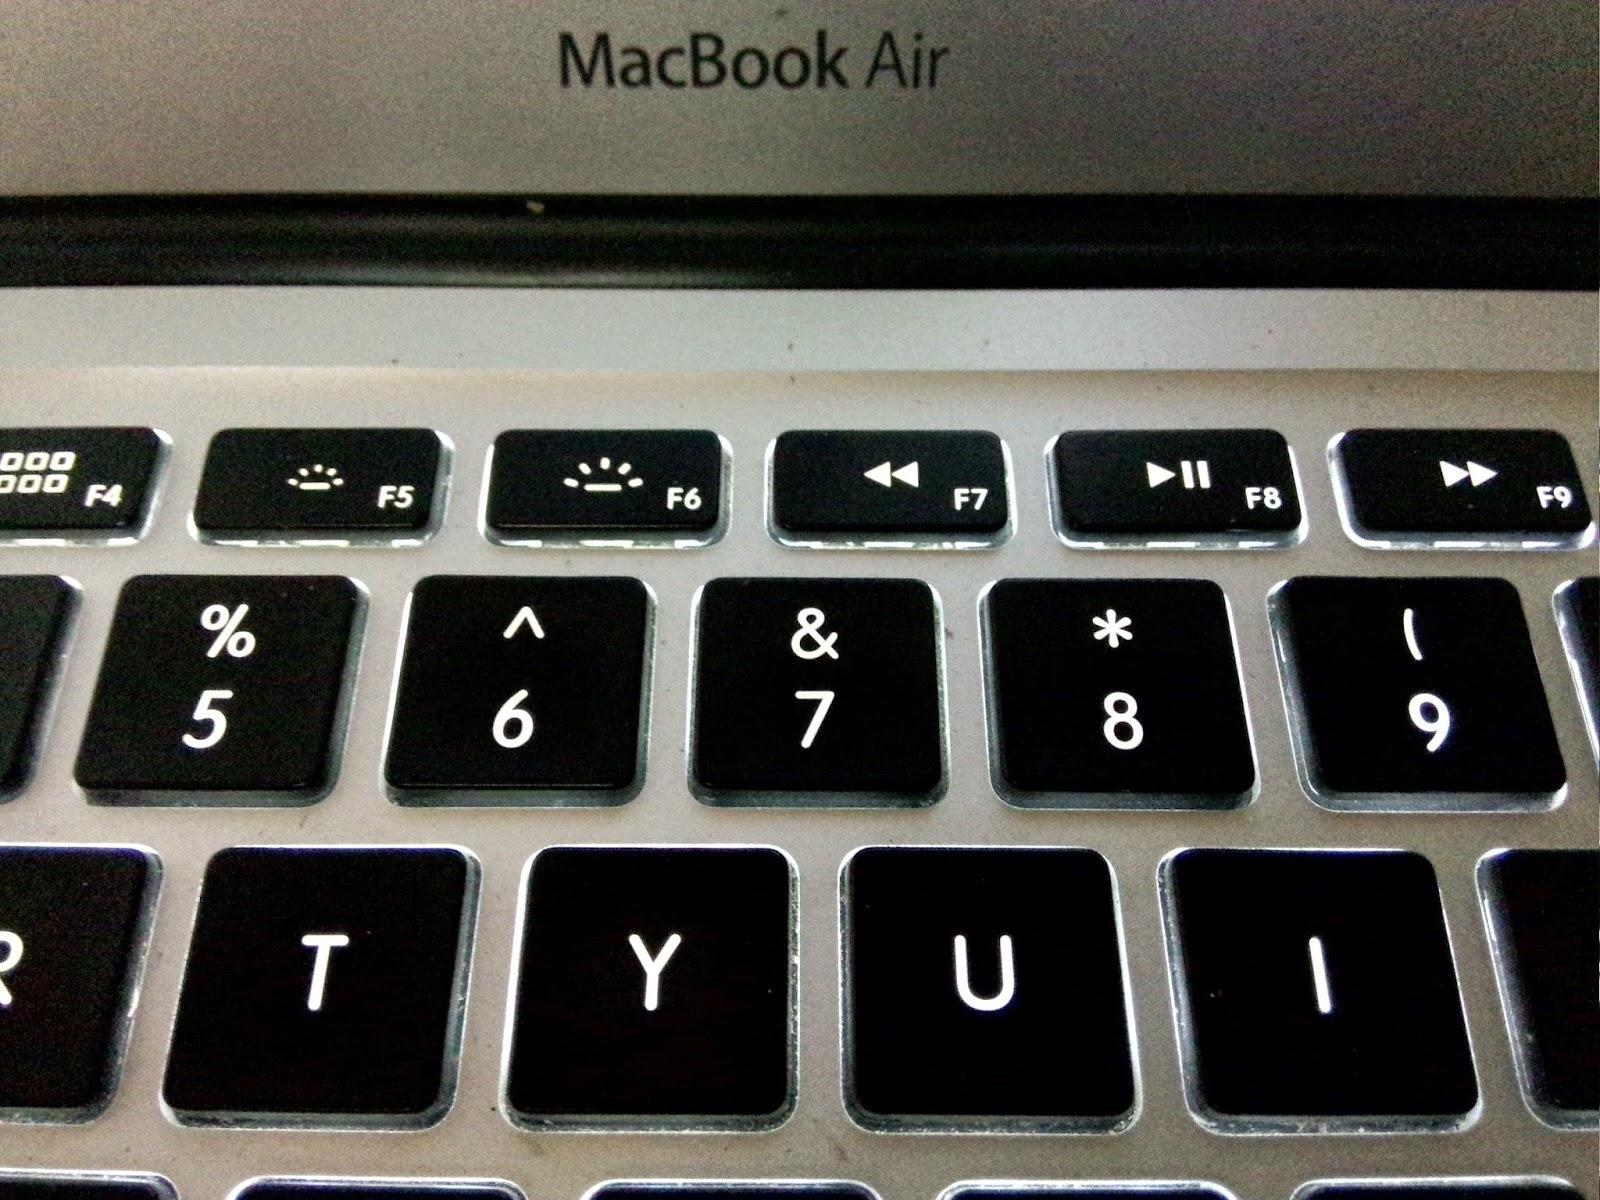 Macbook键盘的顶端功能键设计